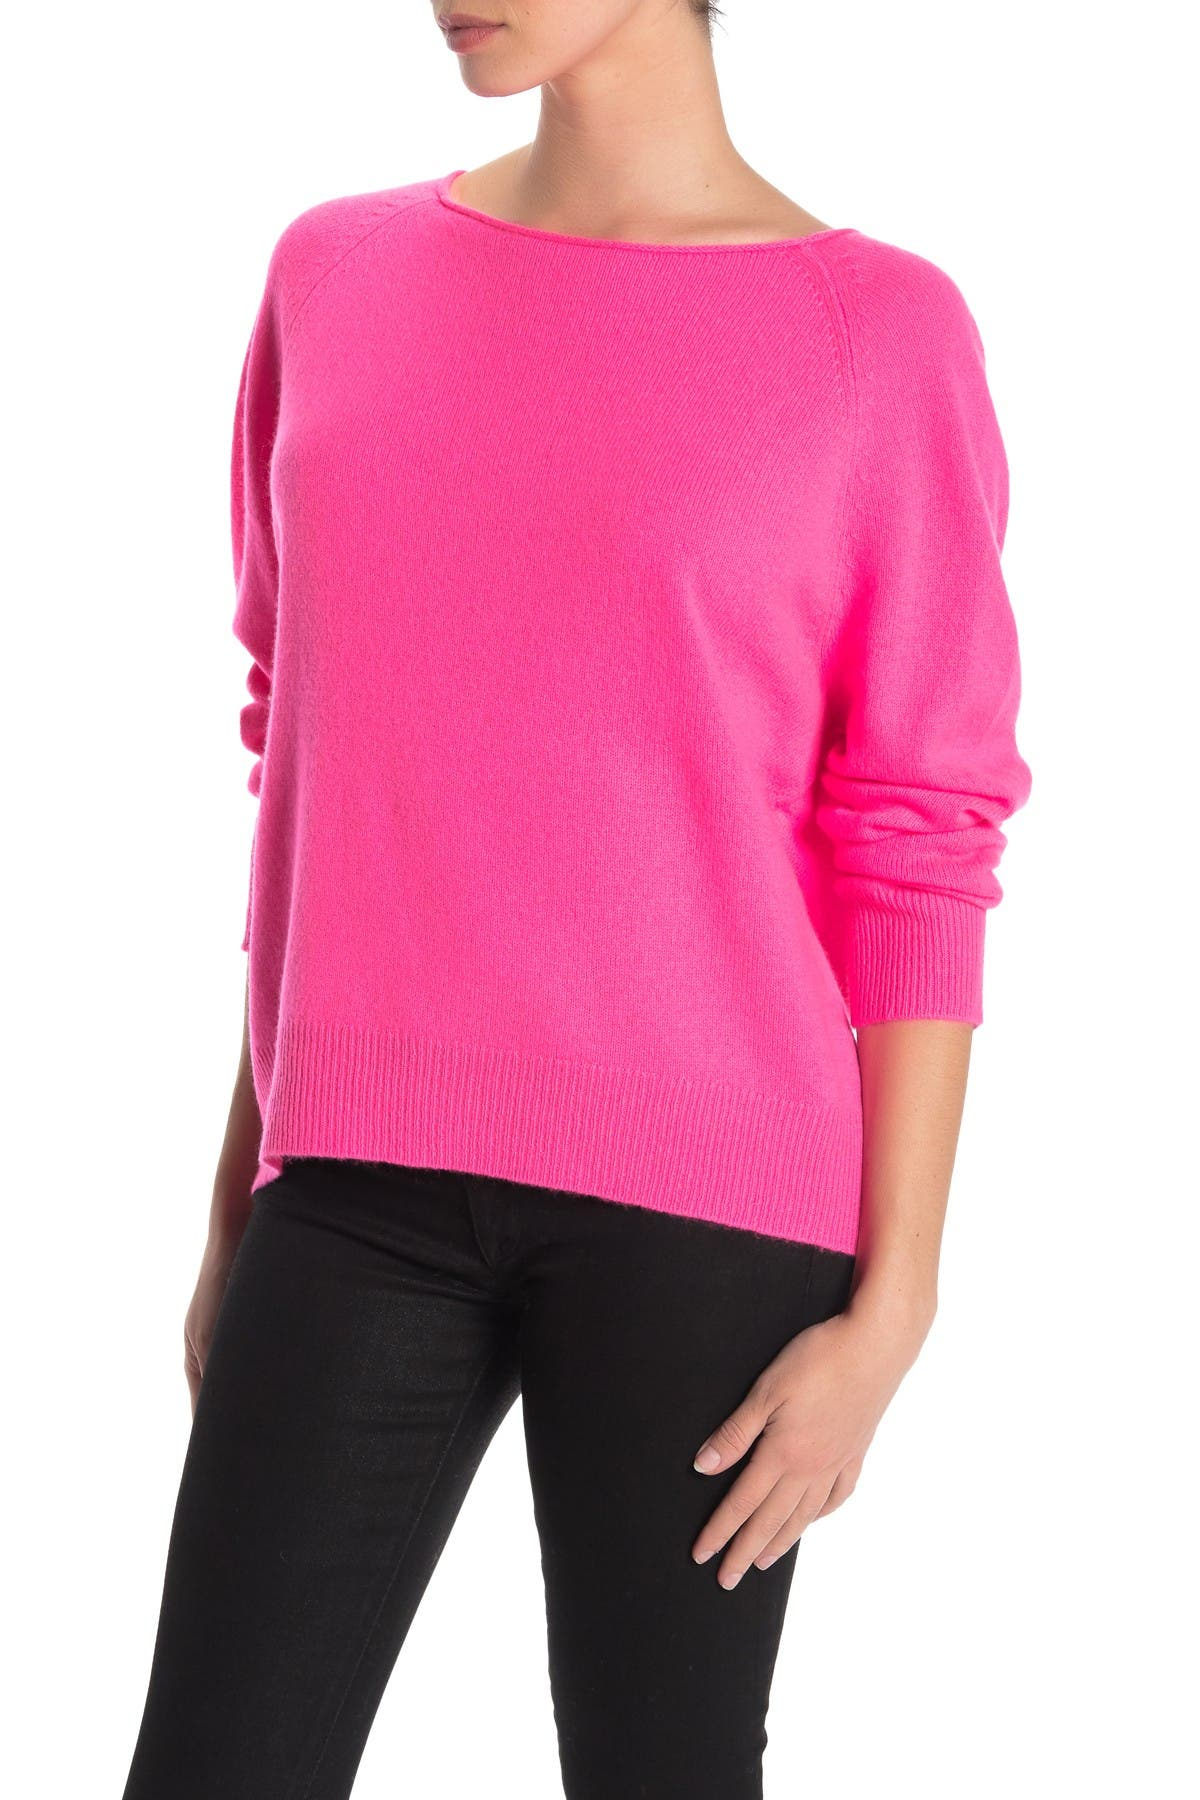 Image of 360 Cashmere Jolene Boatneck Cashmere Sweater